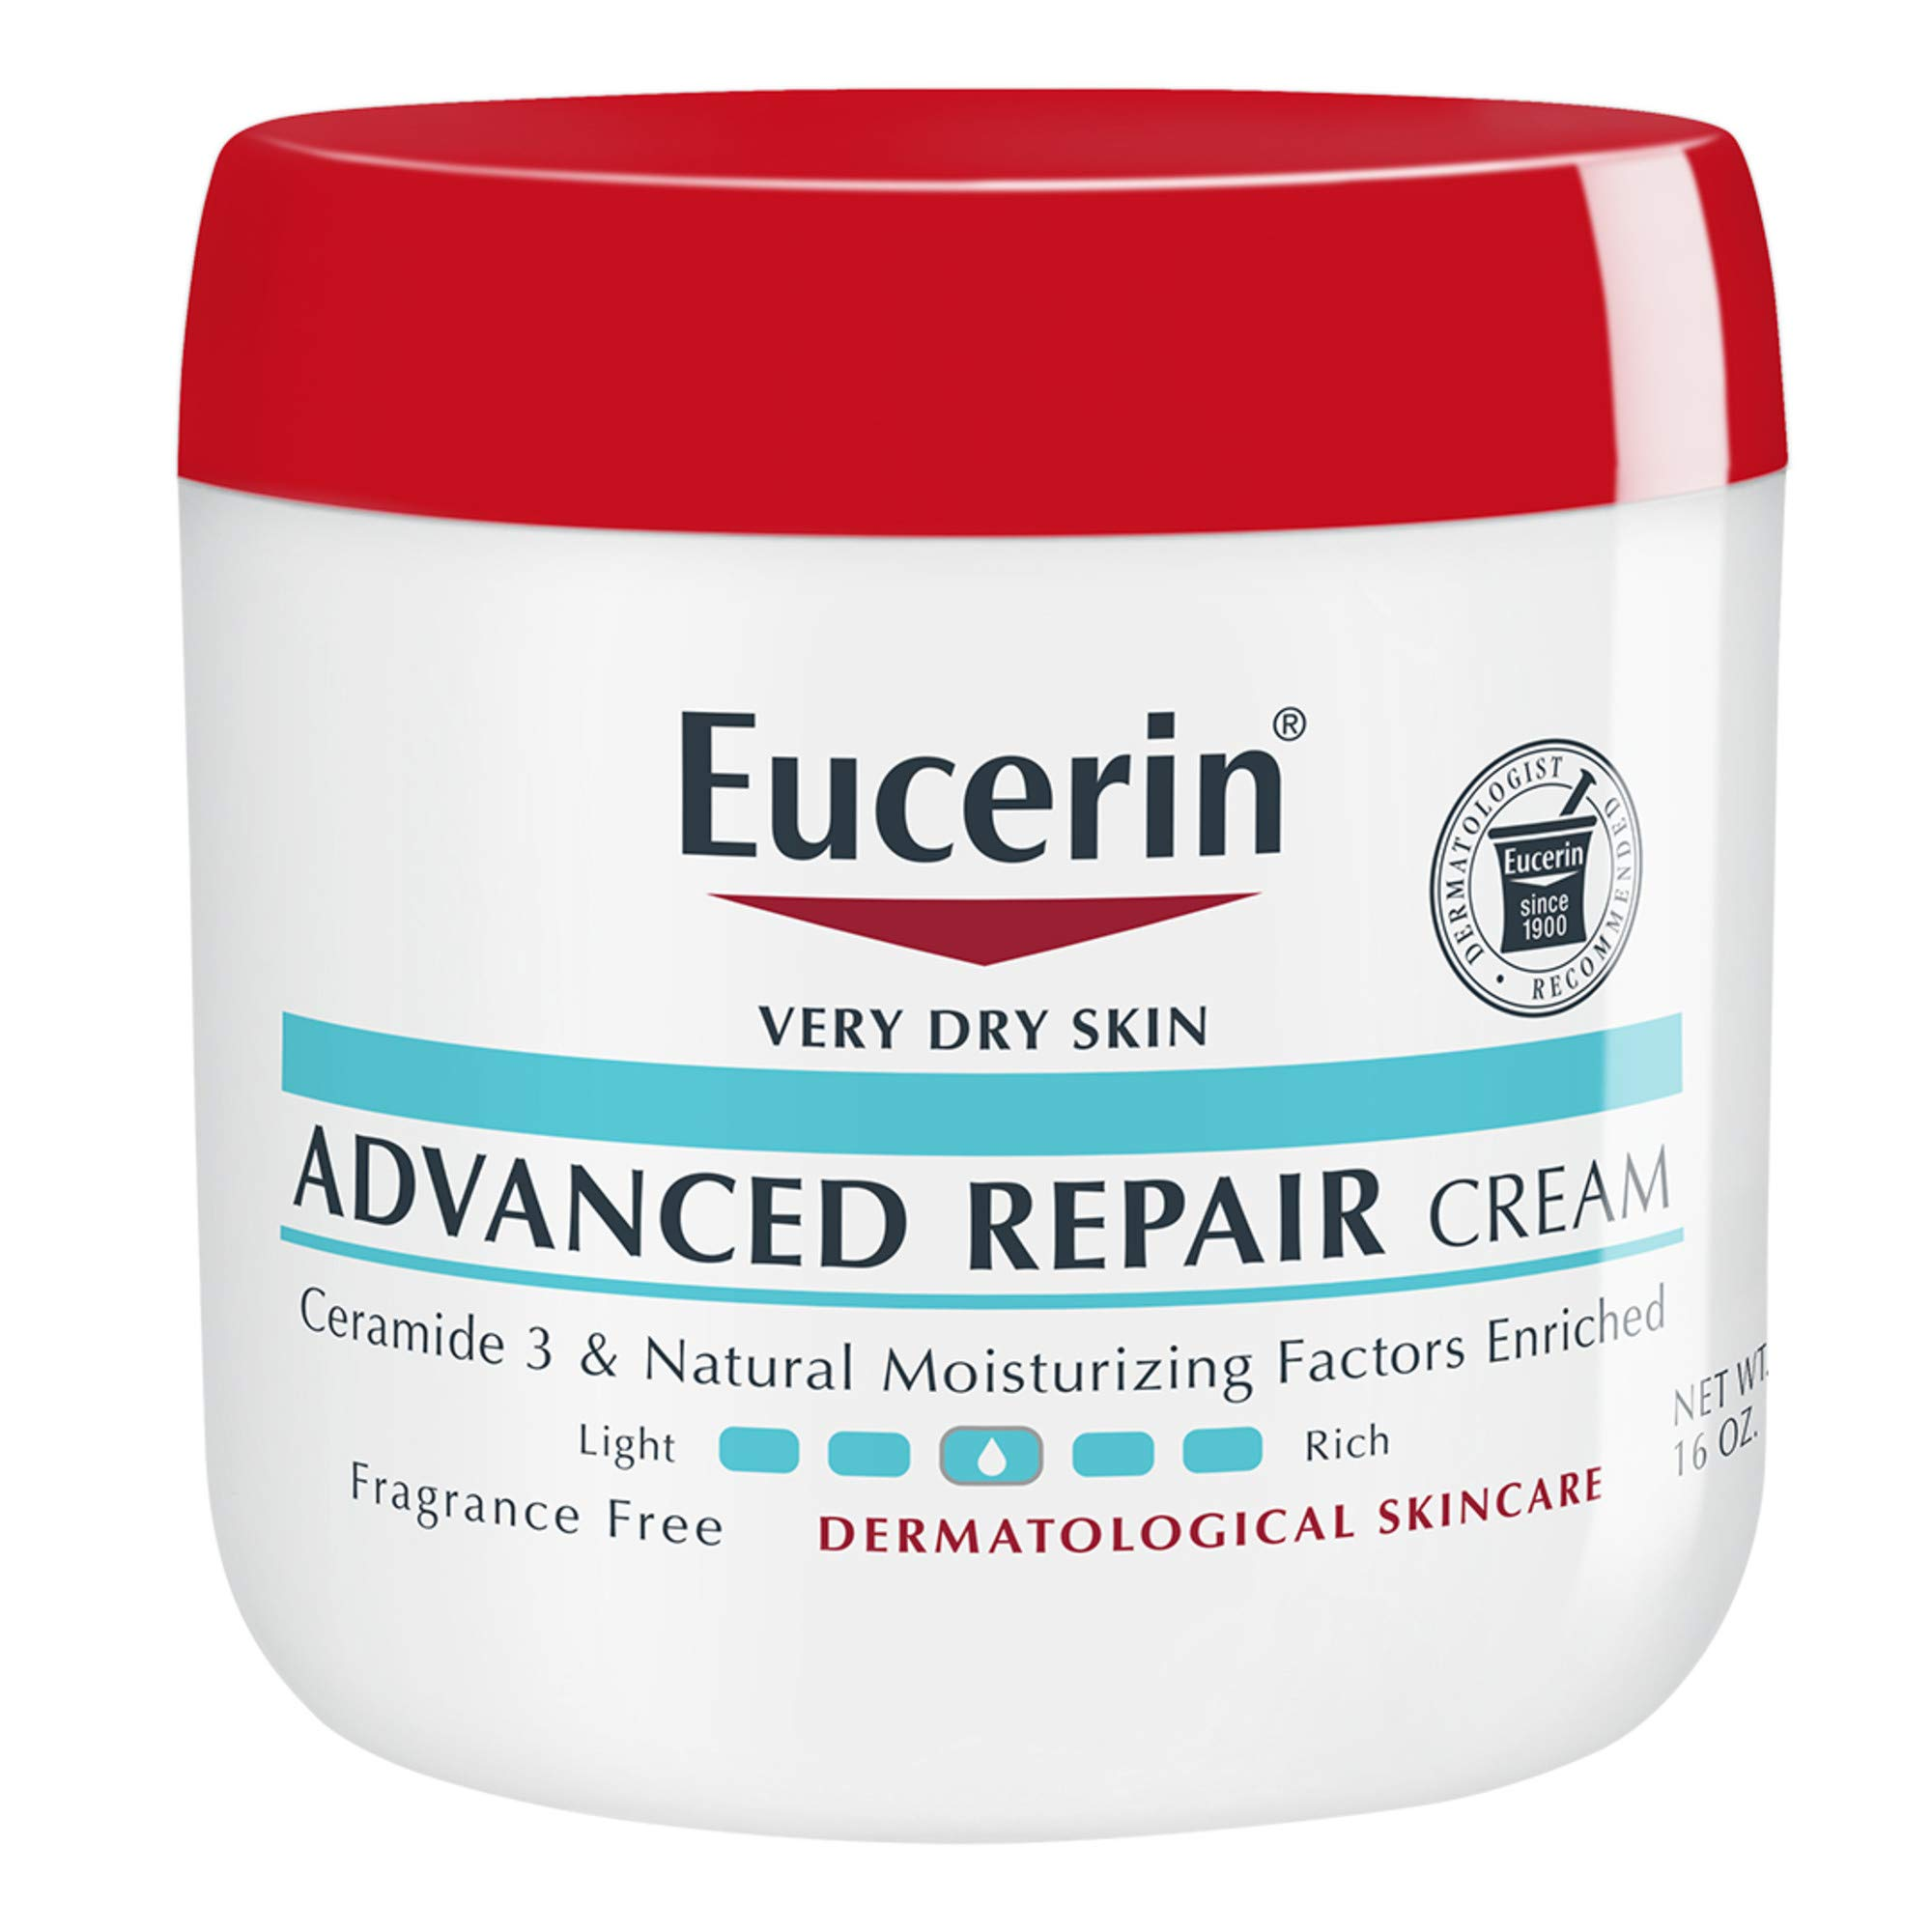 Eucerin Advanced Repair Cream - Fragrance Free, Full Body Lotion for Very Dry Skin - 16 oz. Jar by Eucerin